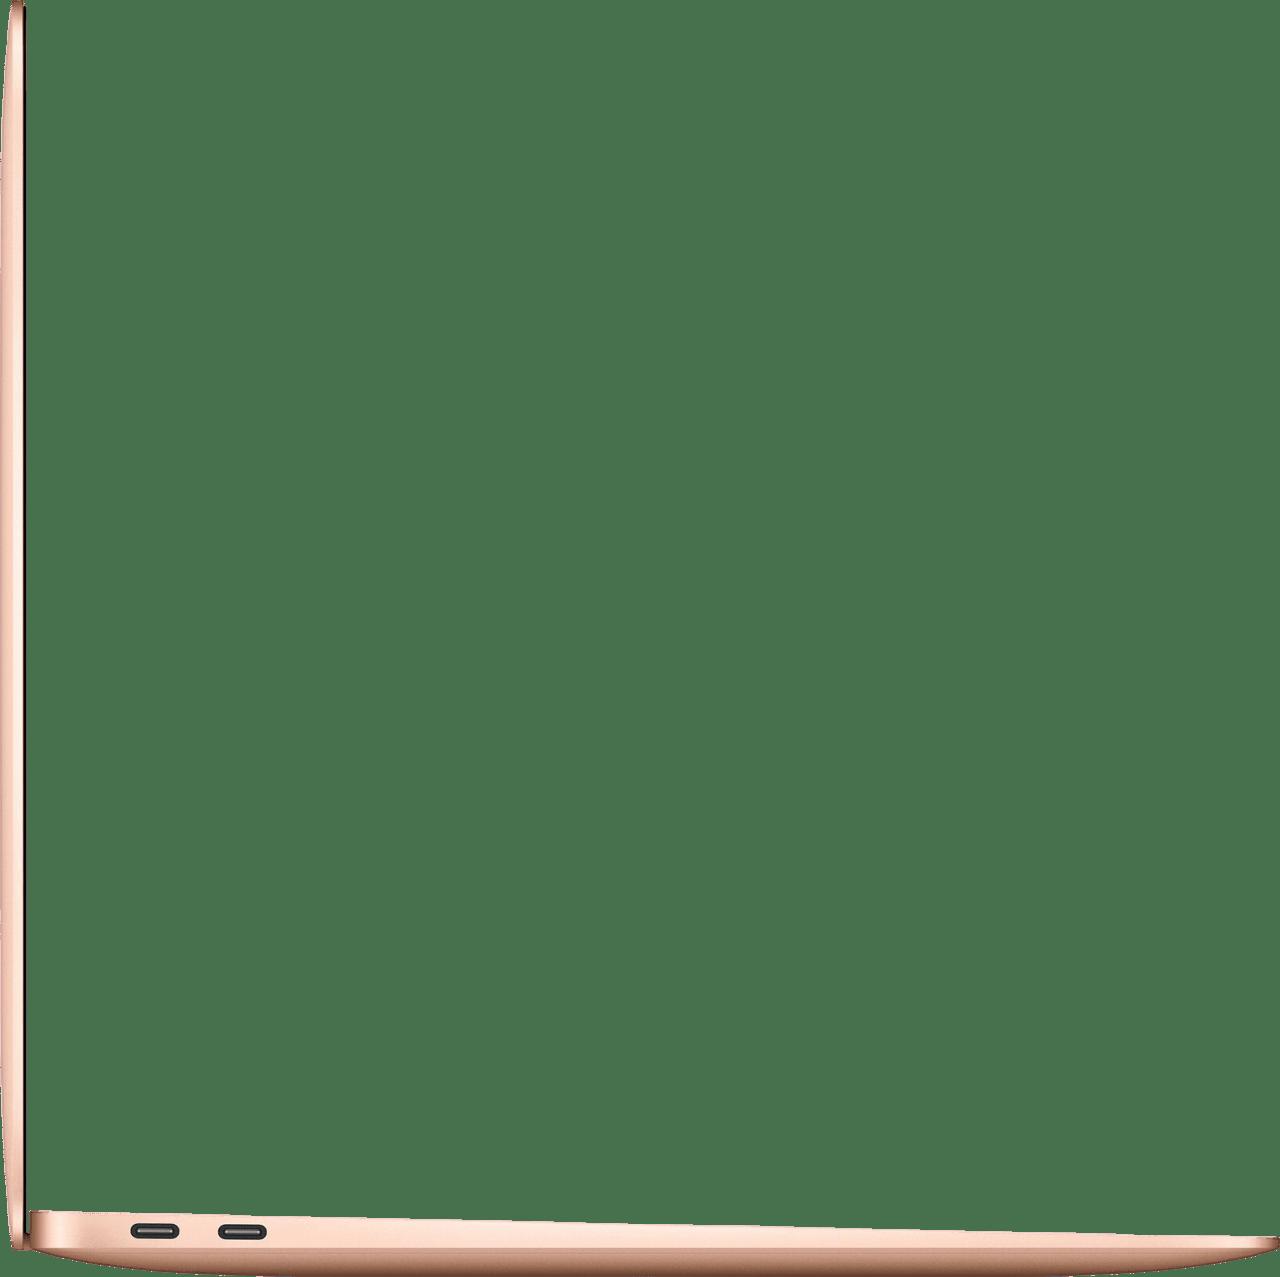 Gold Apple MacBook Air (Late 2020).2